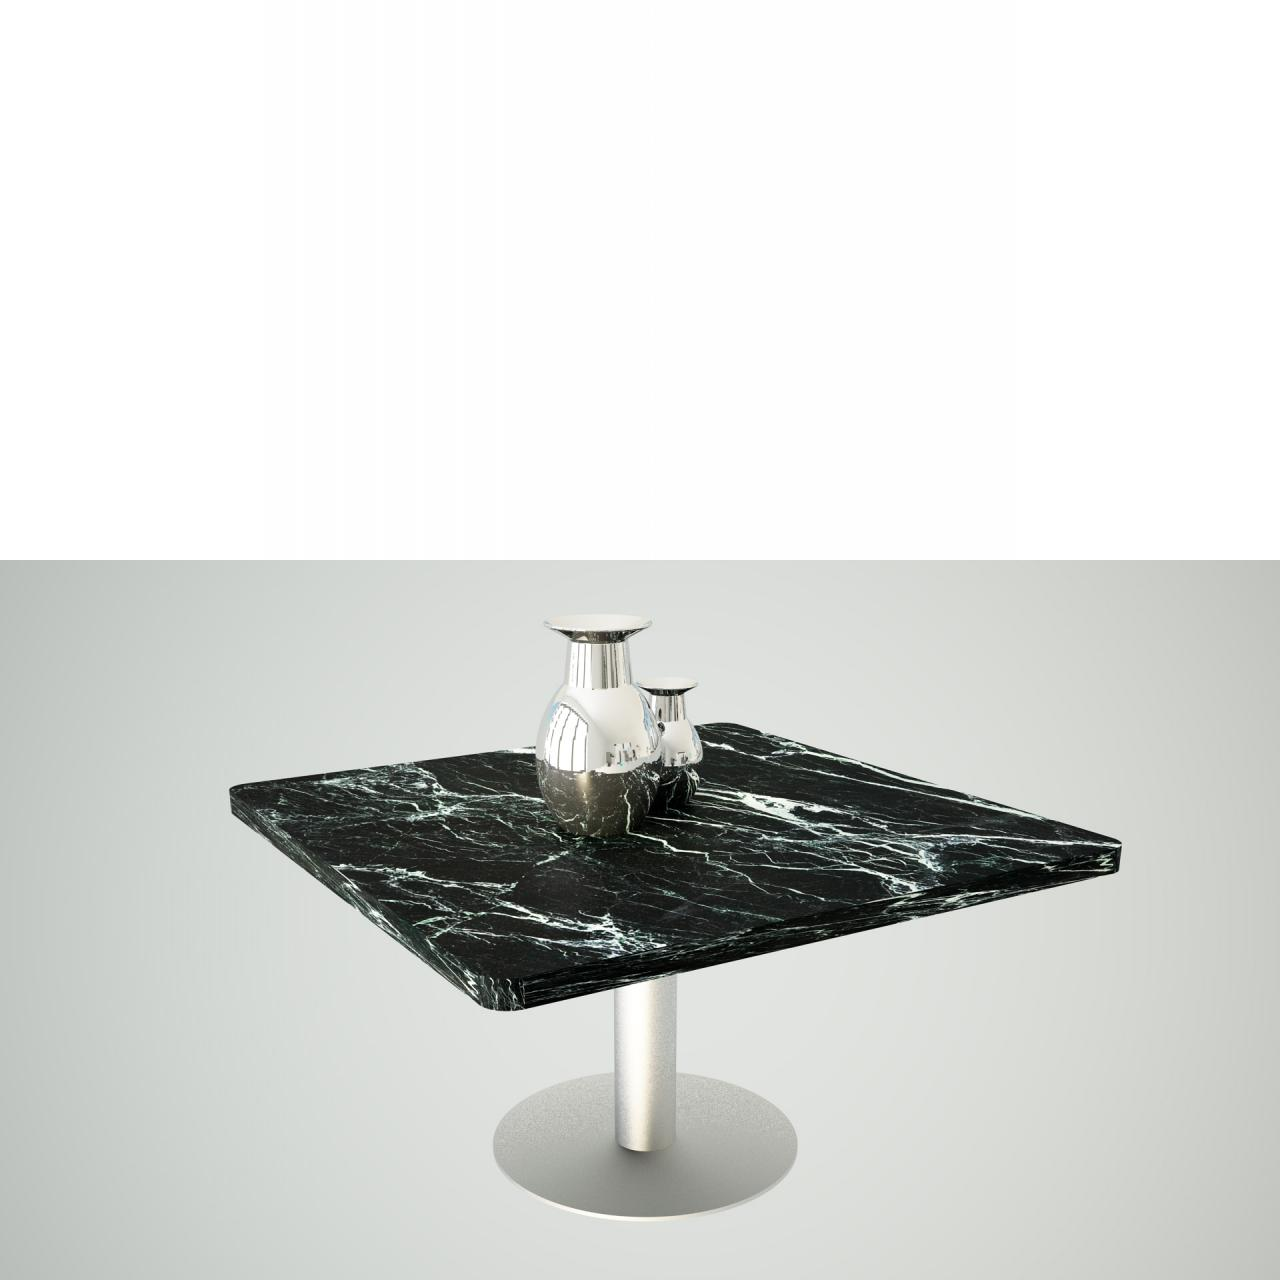 Couchtisch Concept In Schwarz Weiss Mit Marmor Optik Couchtische